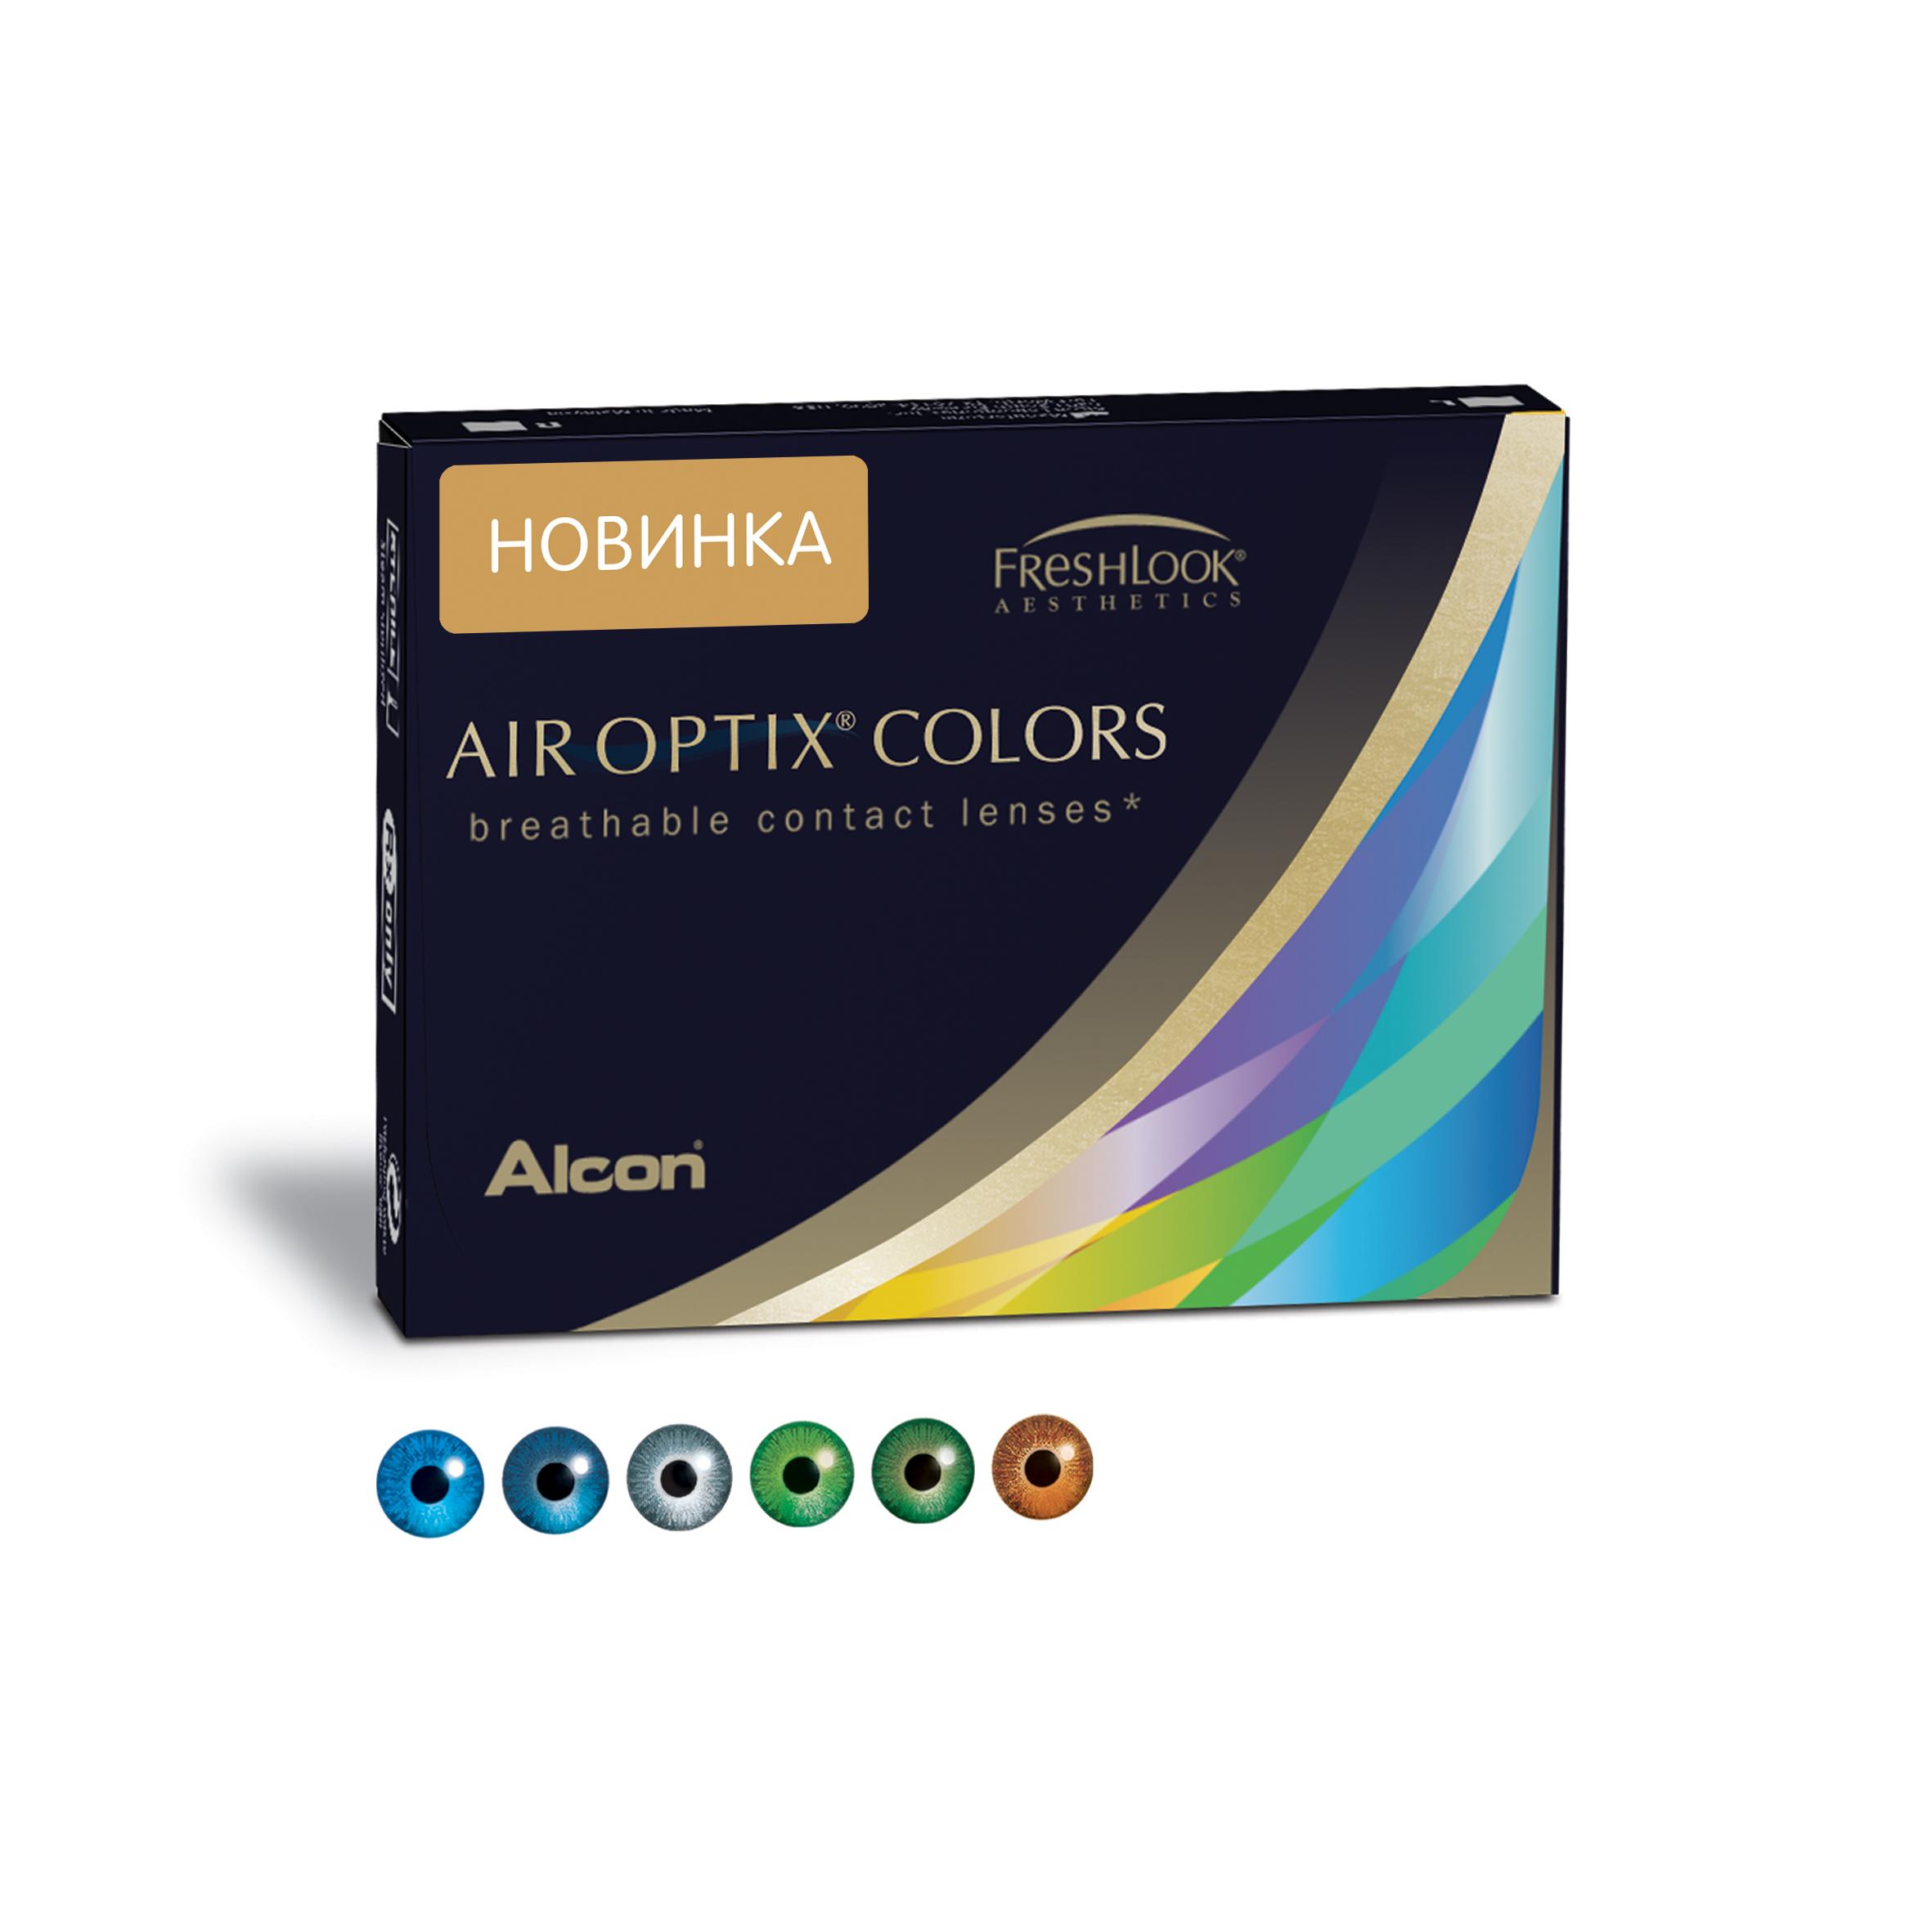 Аlcon контактные линзы Air Optix Colors 2 шт -3.75 Blue ( 31746220 )